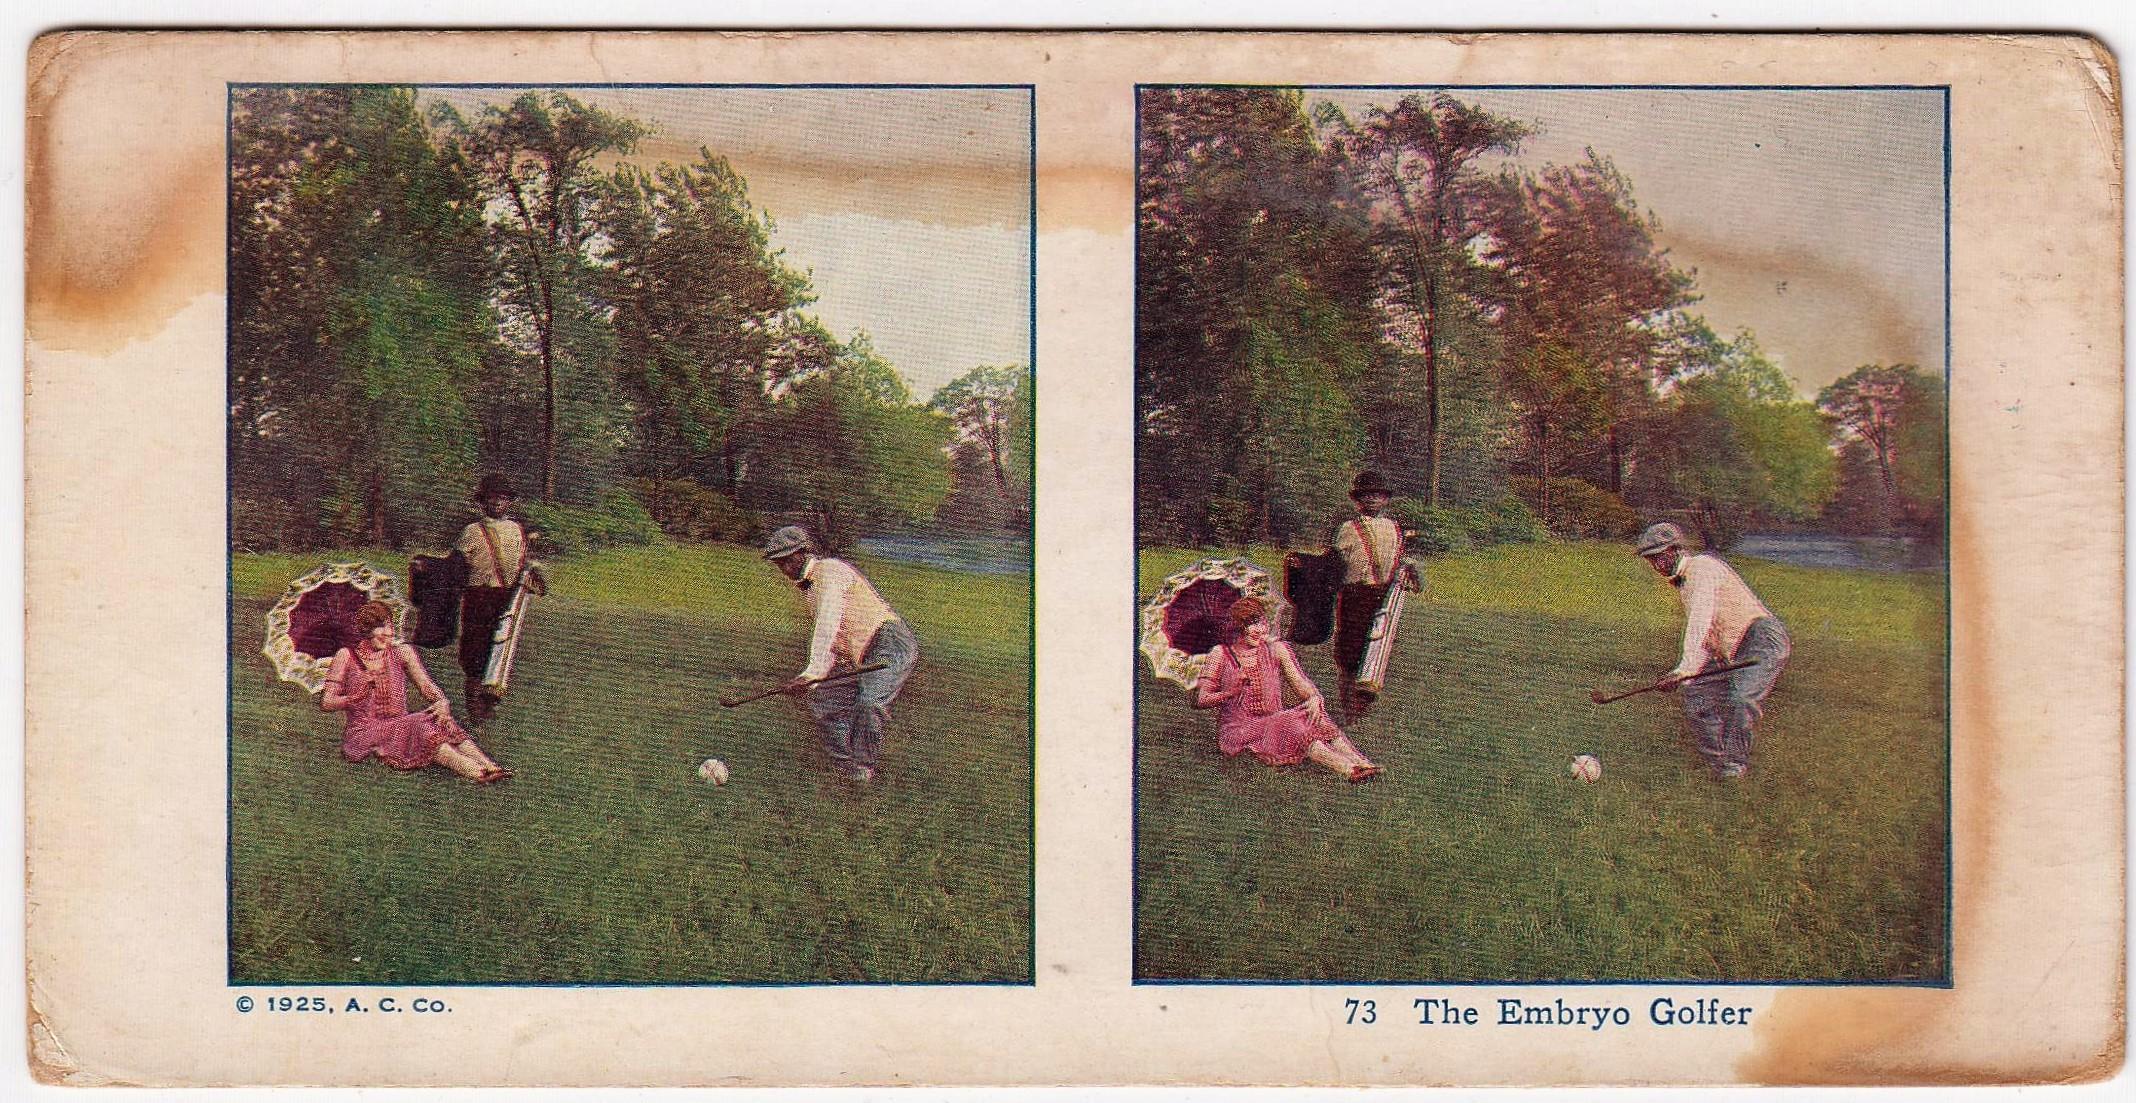 1925 AC Stereoview Golf Card